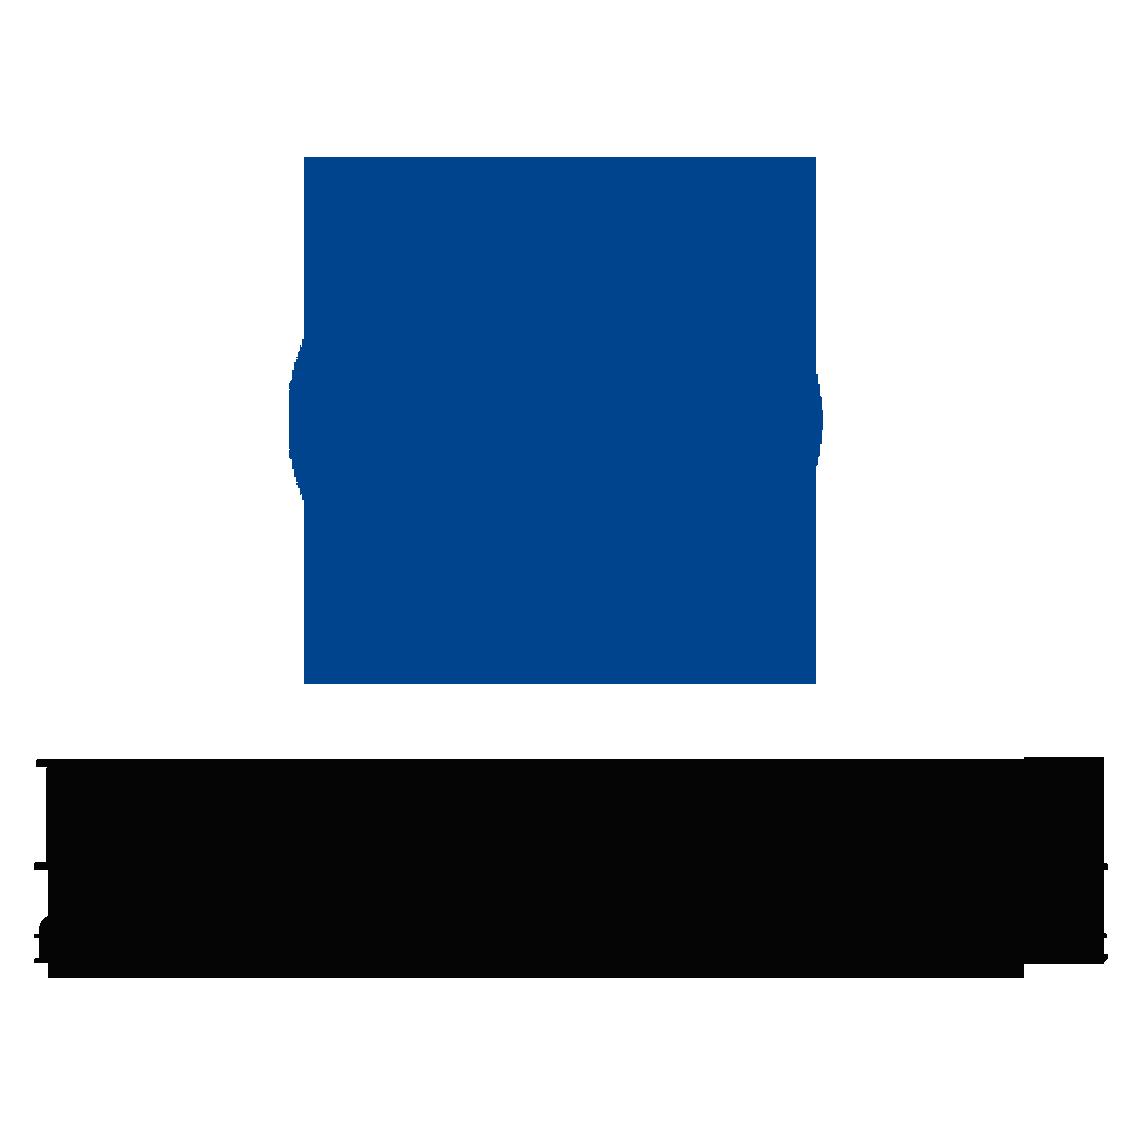 EBRD – European Bank for Reconstruction and Development